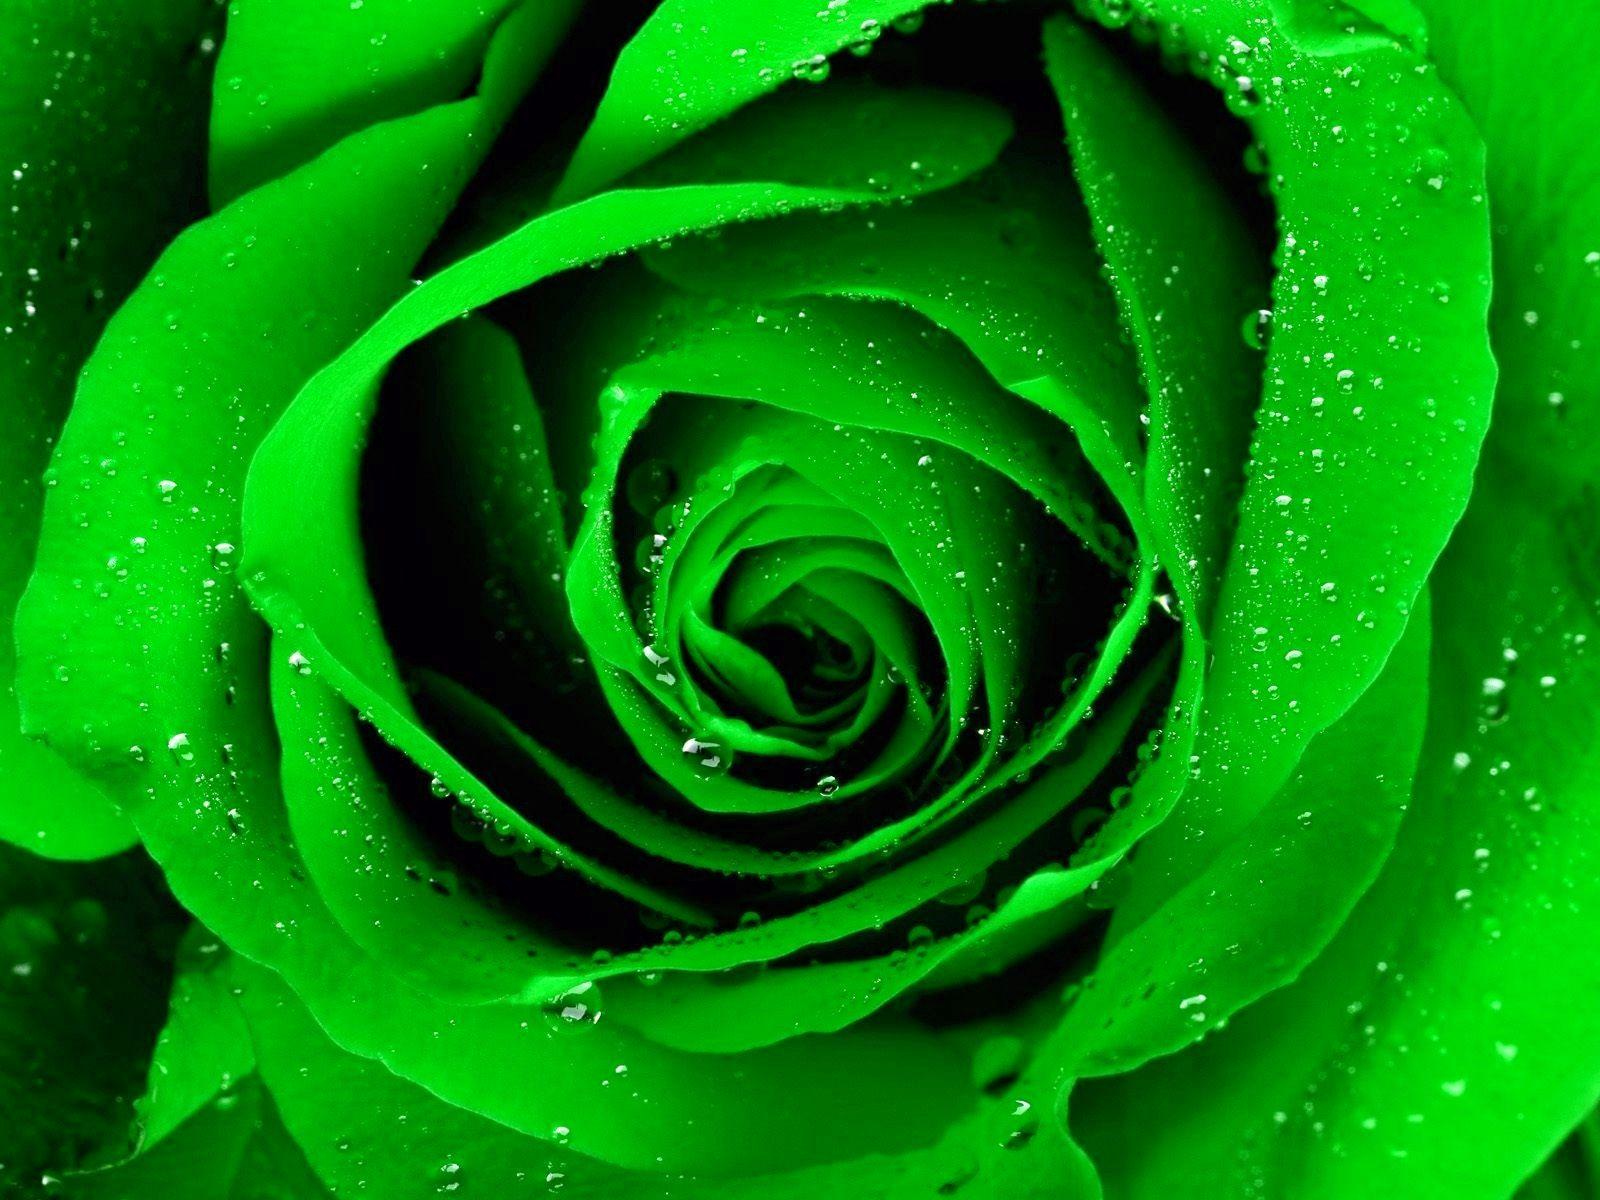 Green Rosa Verde Flores Verdes Rosas Arco Iris